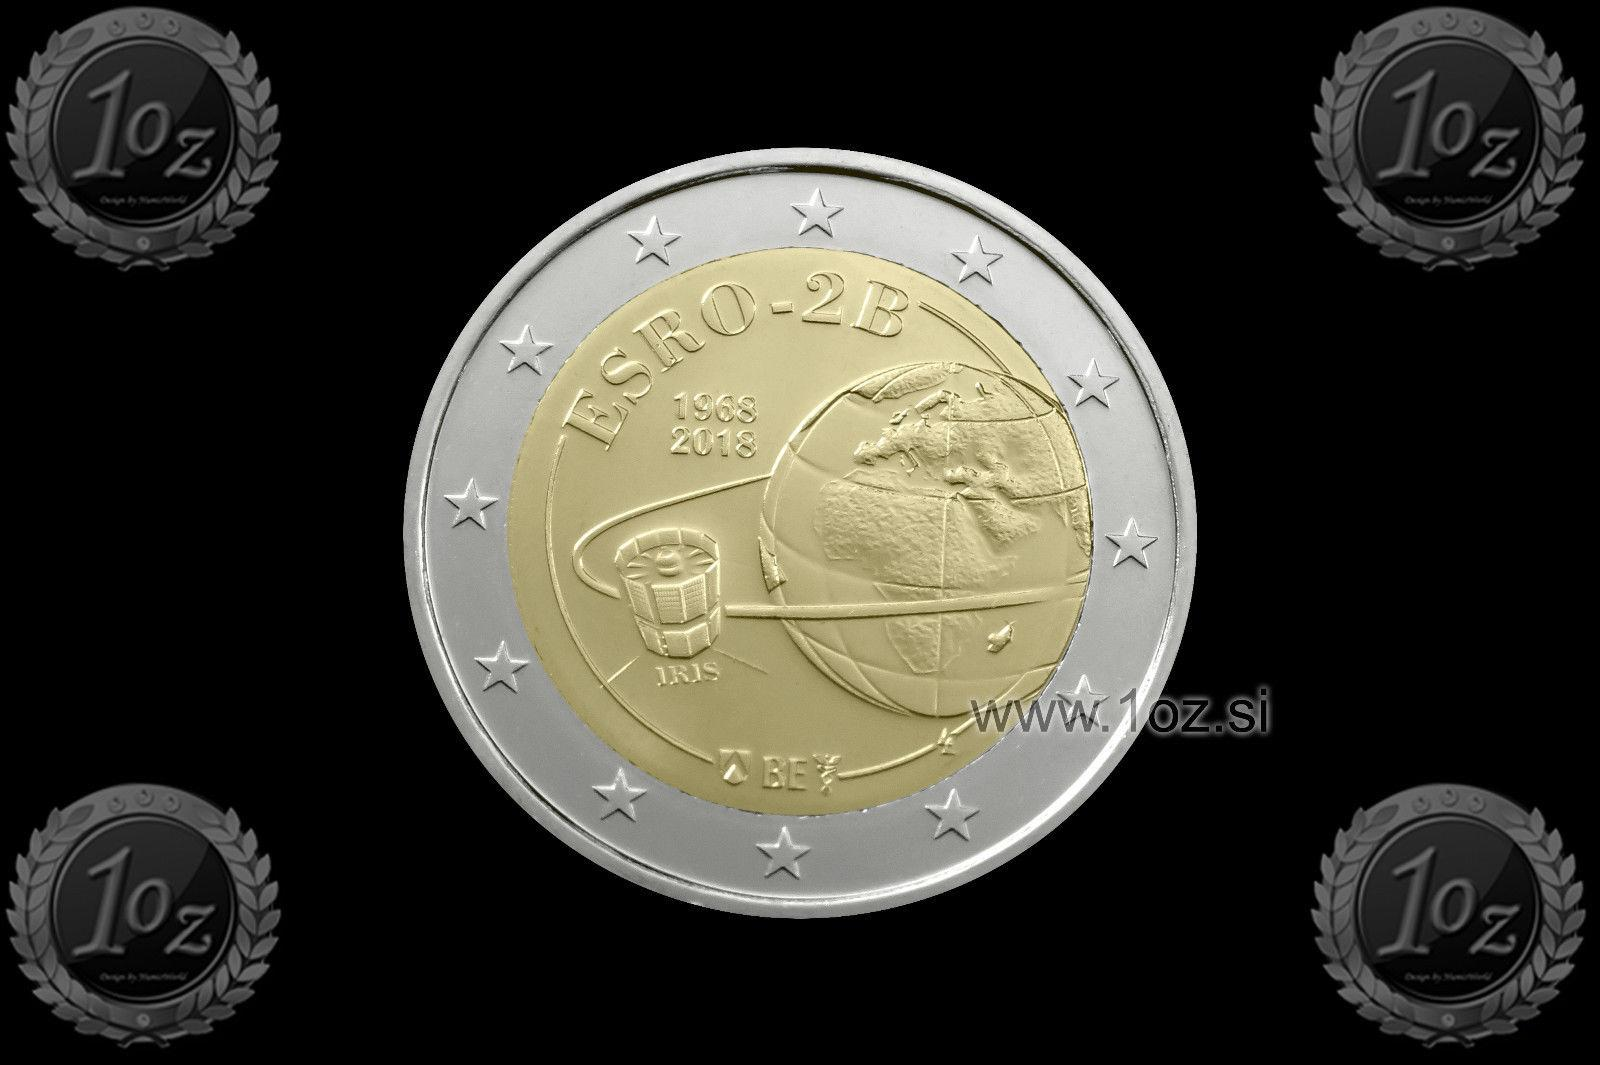 2 euro commemorative coins 2018